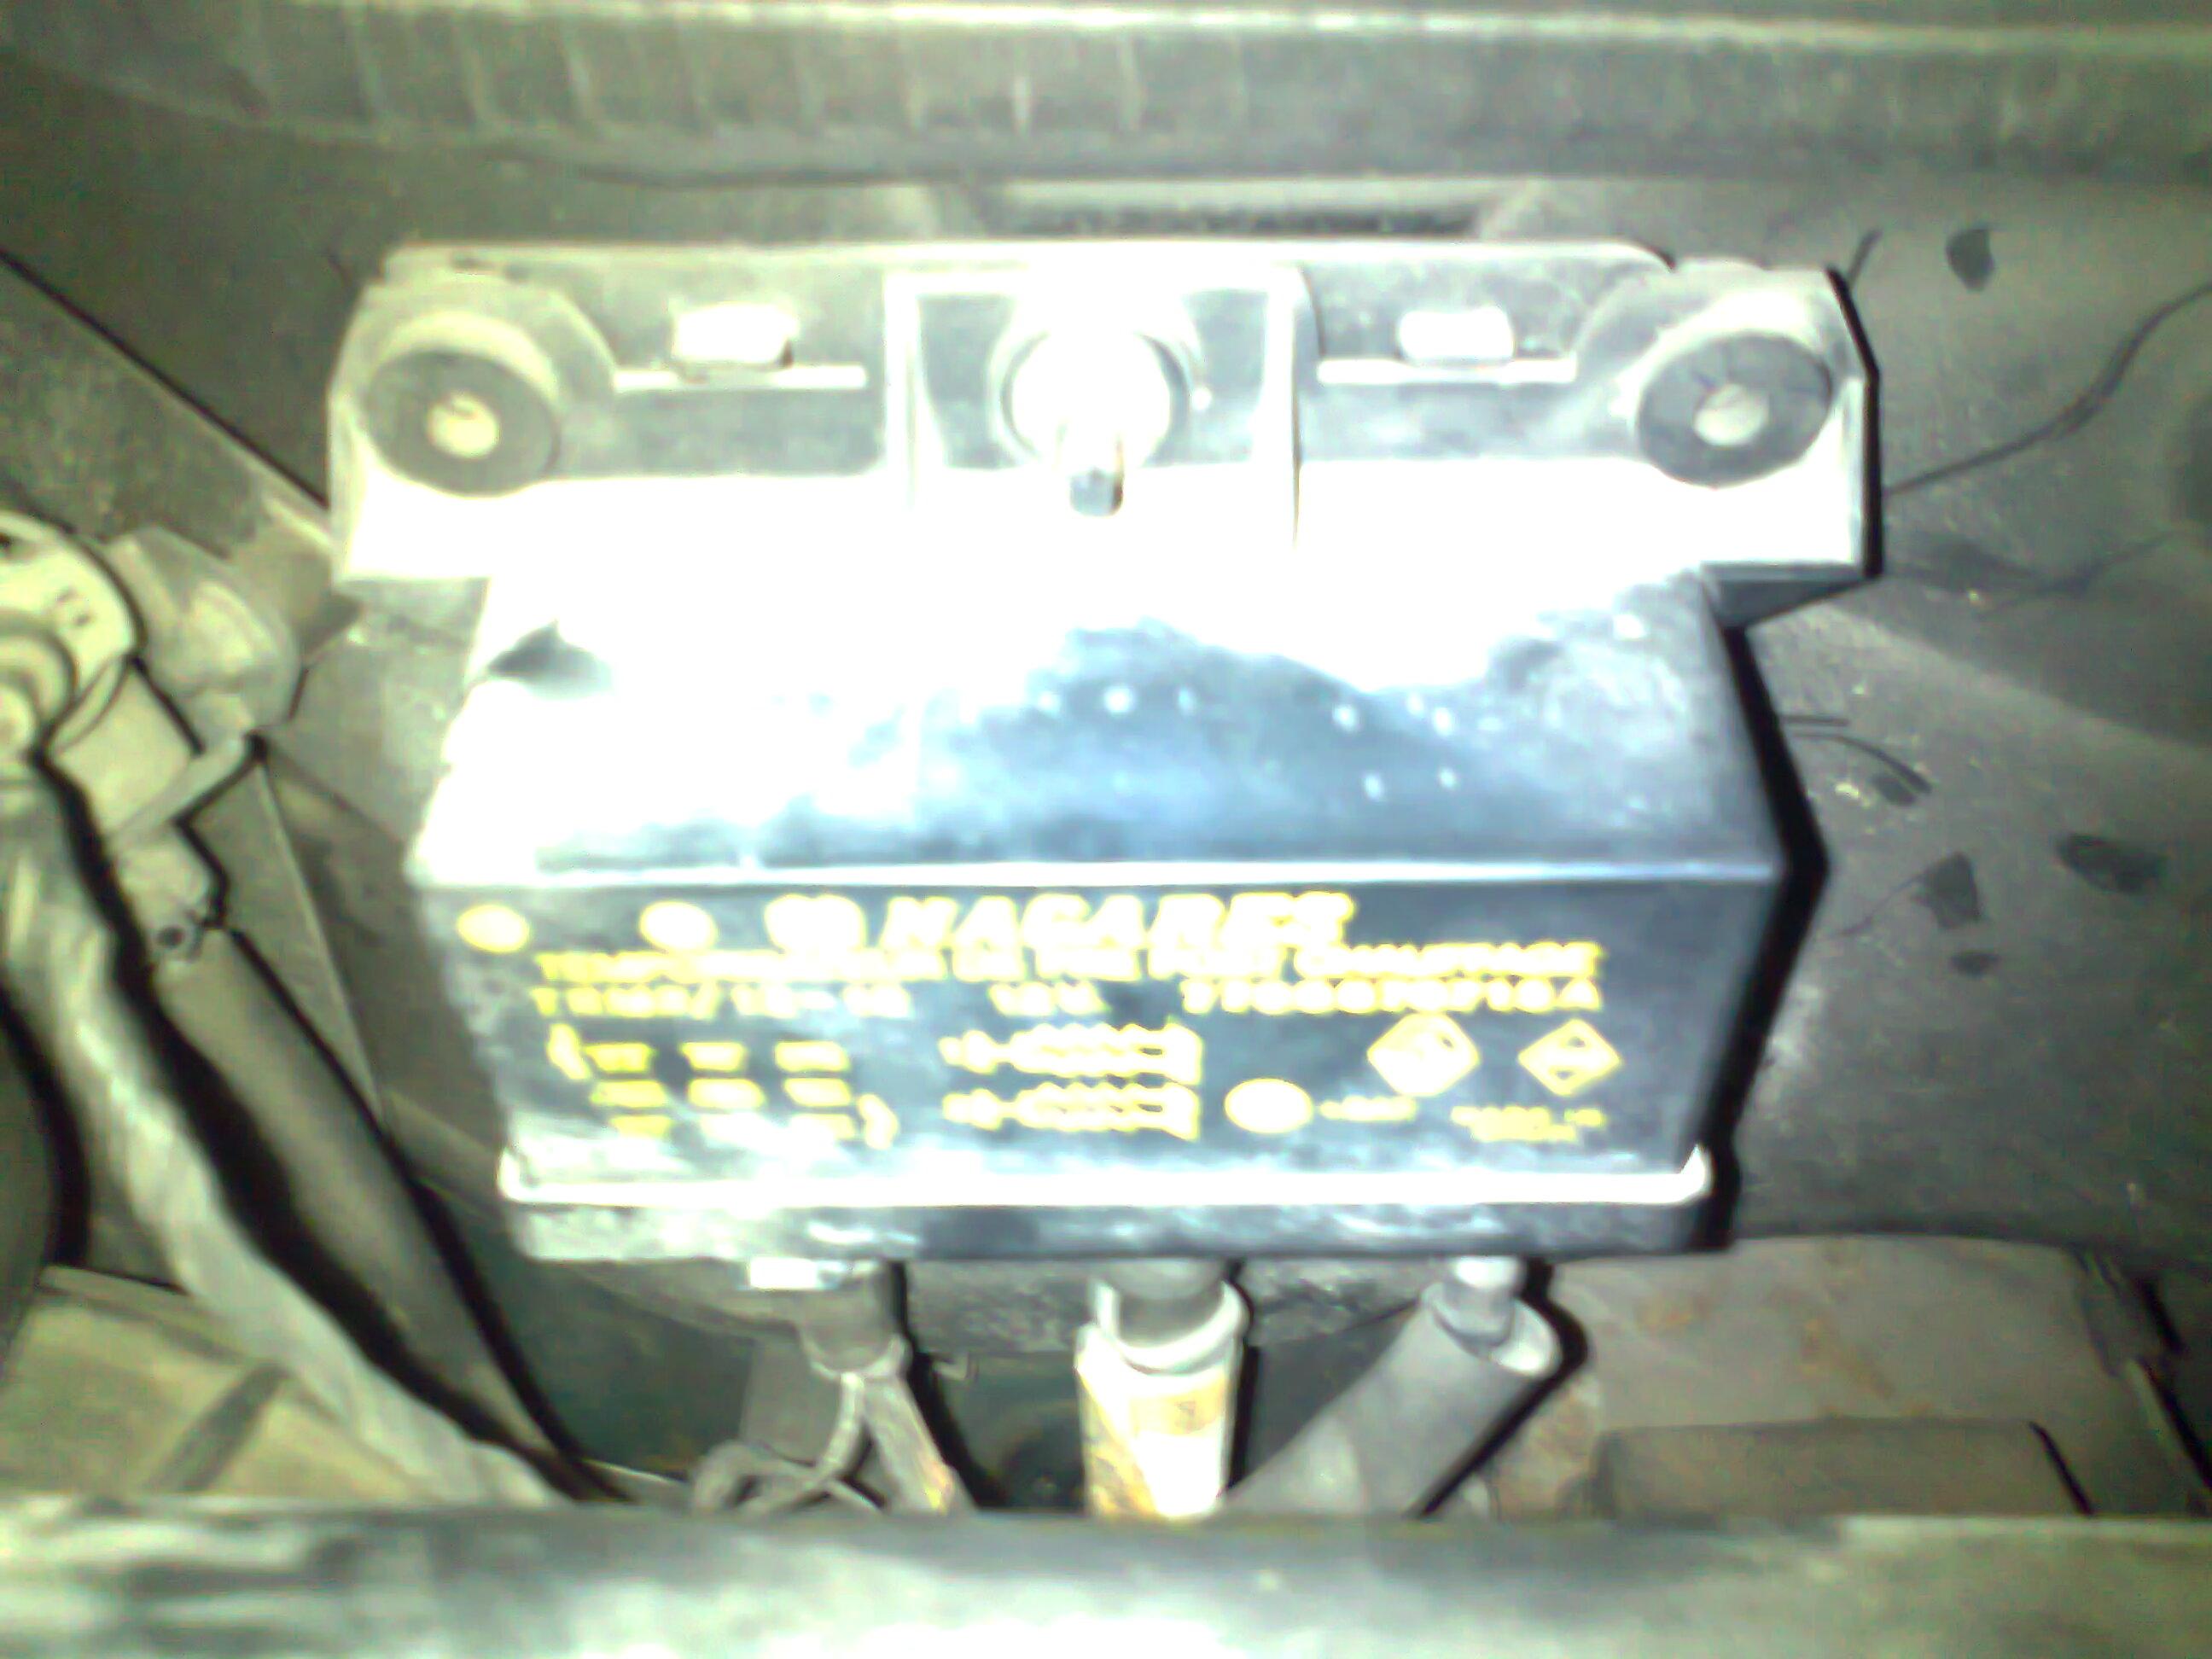 Renault Megane elektryka - auto wariuje